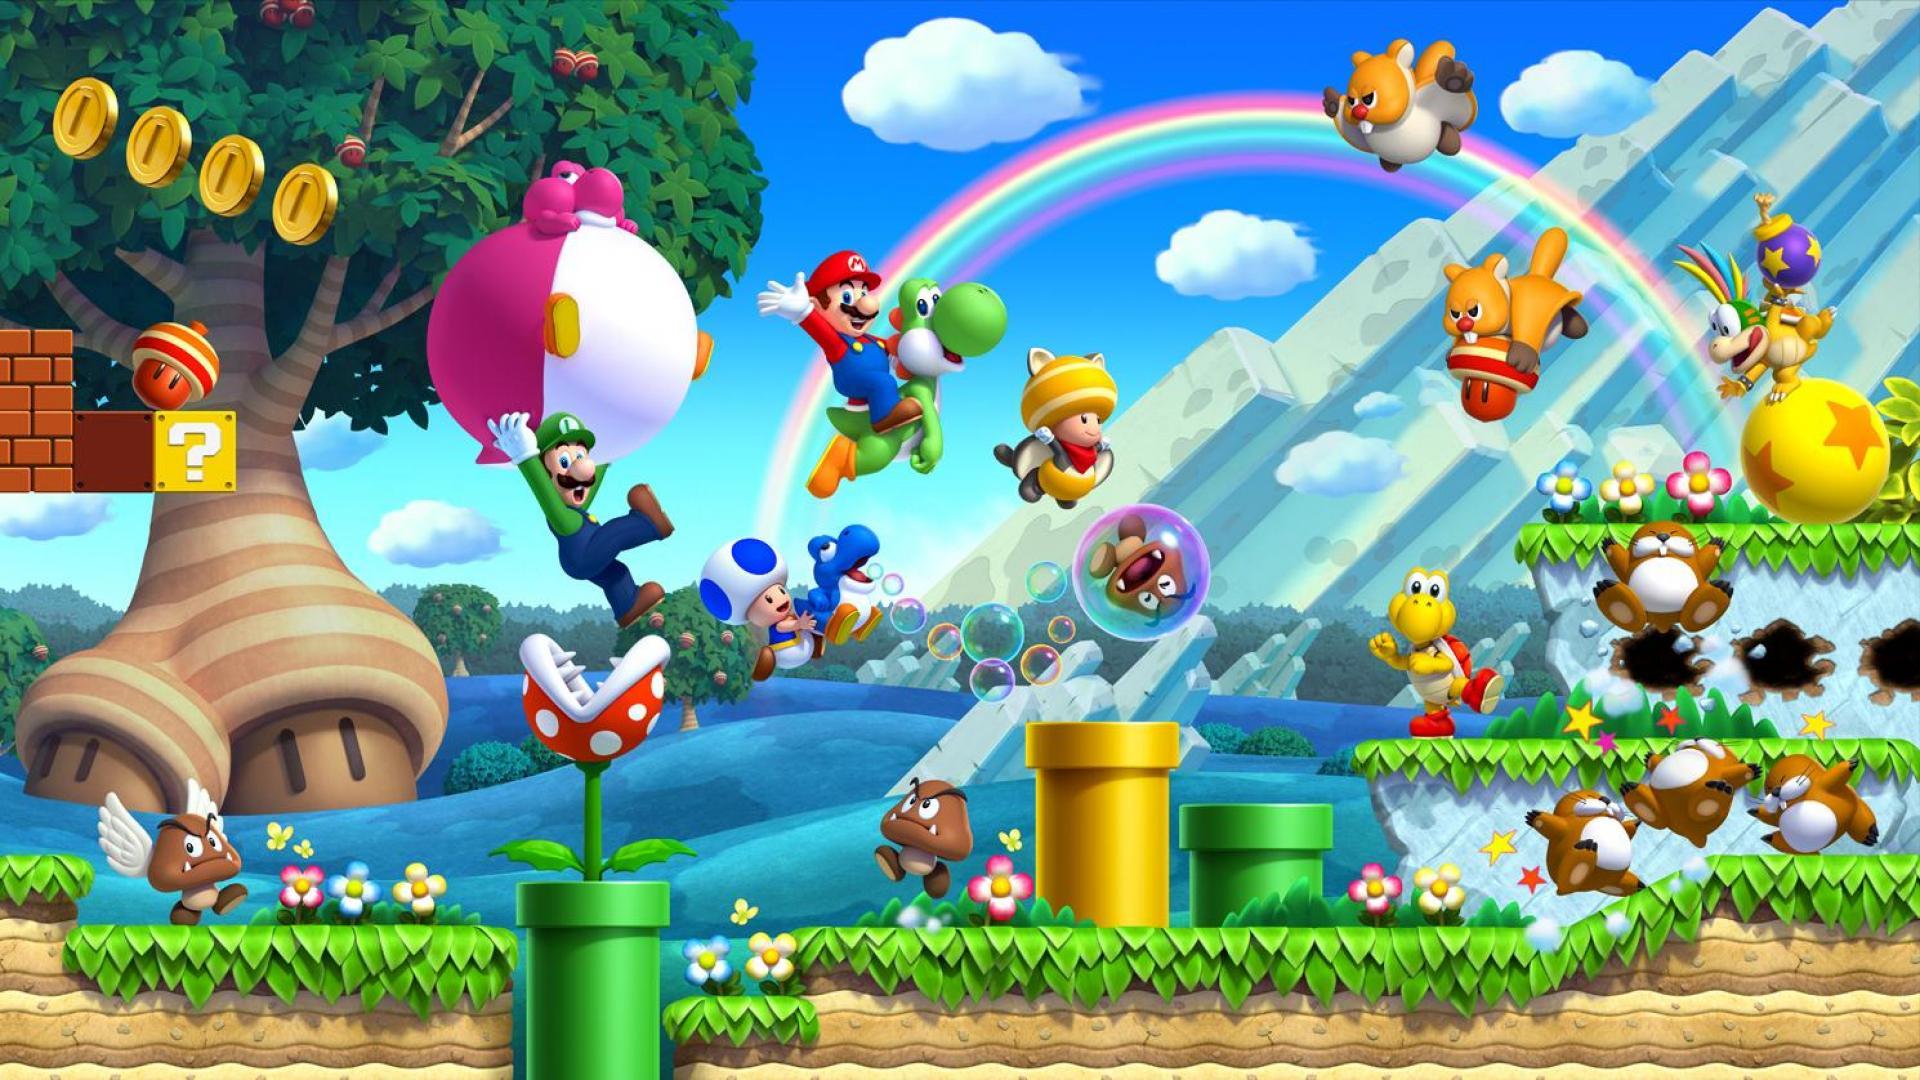 Mario Wallpaper HD Free Download